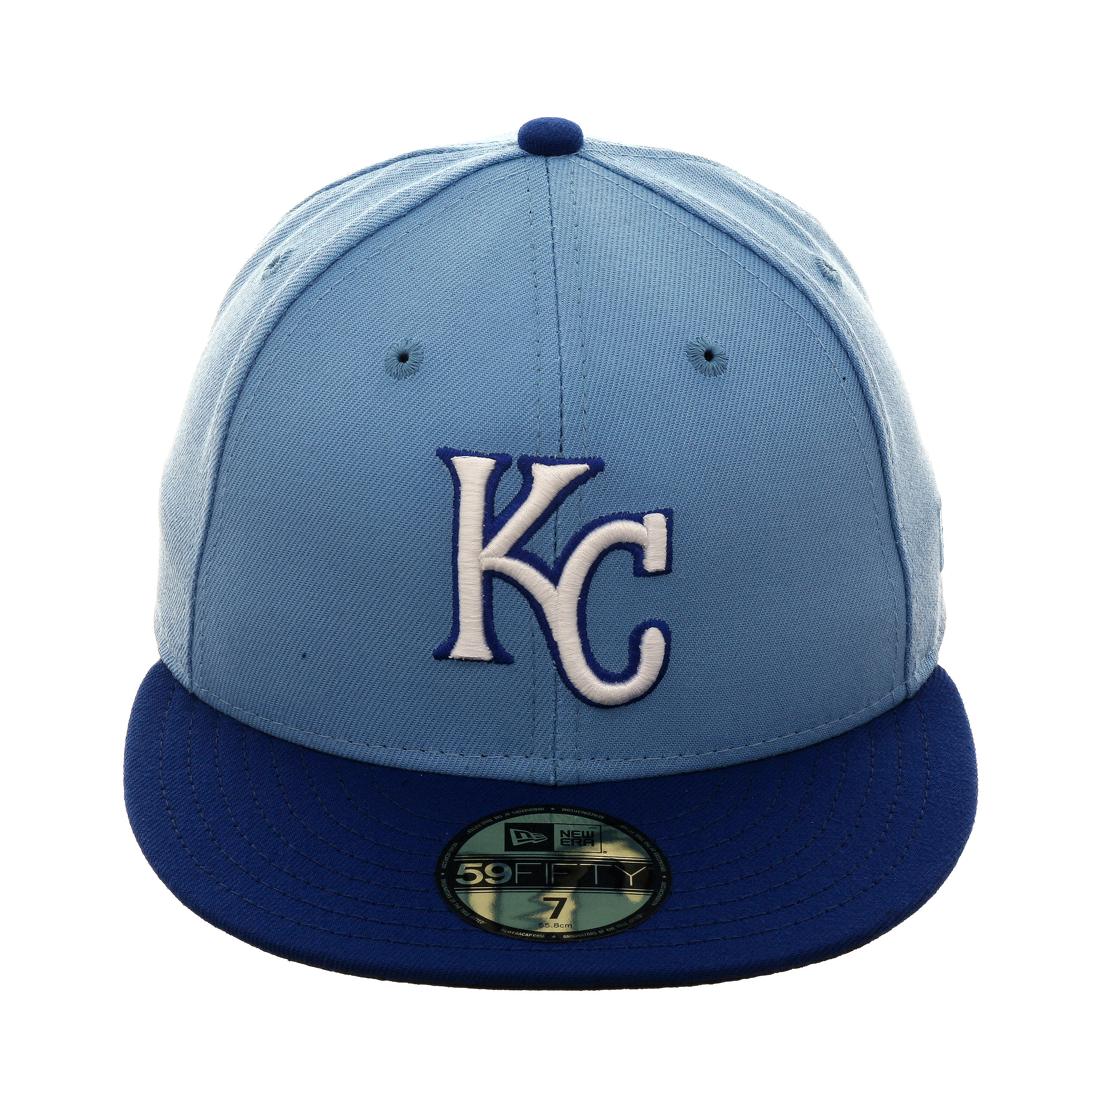 buy popular 0d1ac ef166 Exclusive New Era 59Fifty Kansas City Royals Hat - 2T Light Blue , Royal